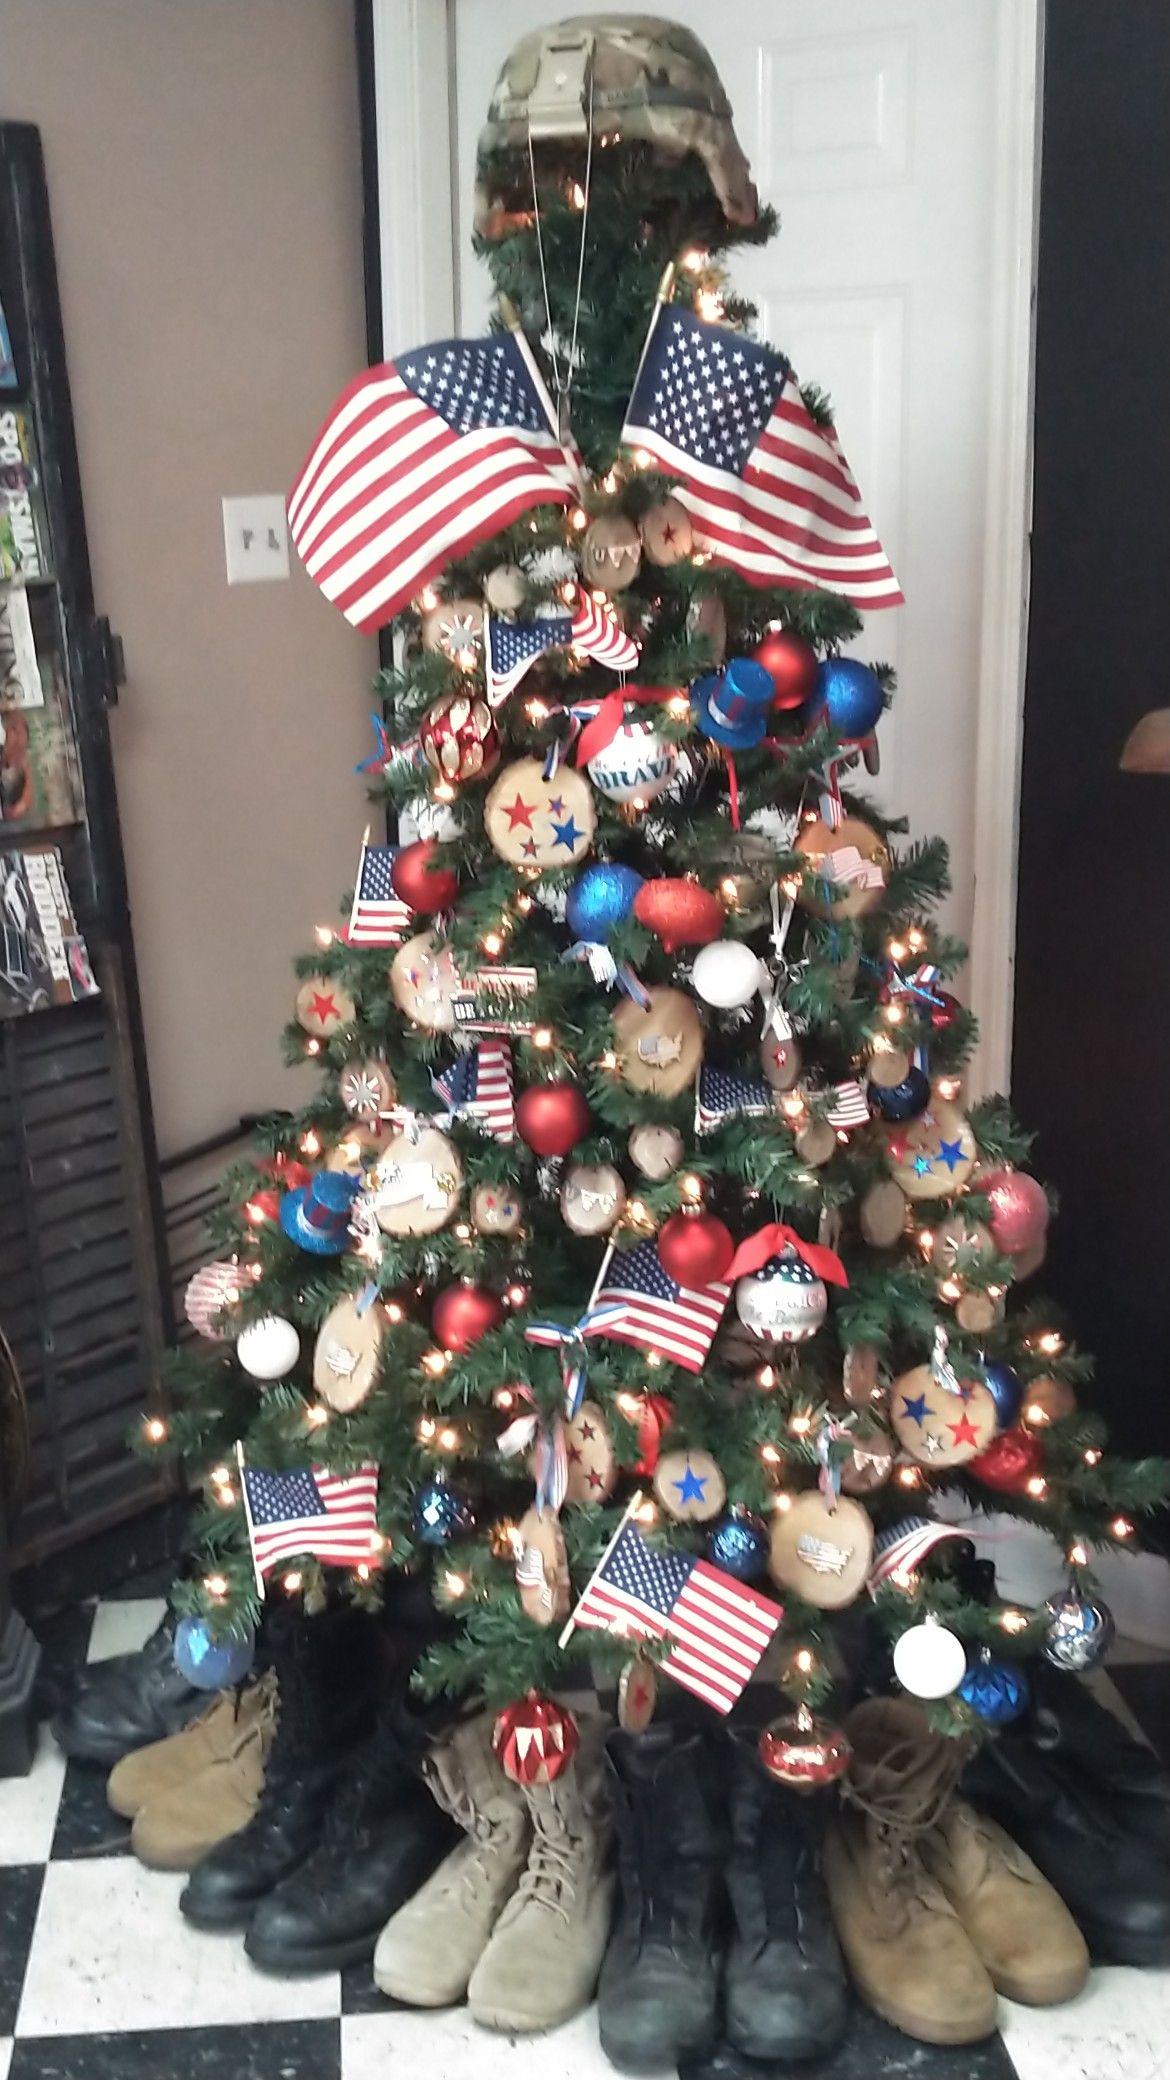 Pin By Aracely Leal On Marine Christmas Tree Patriotic Christmas American Flag Wood Marine Christmas